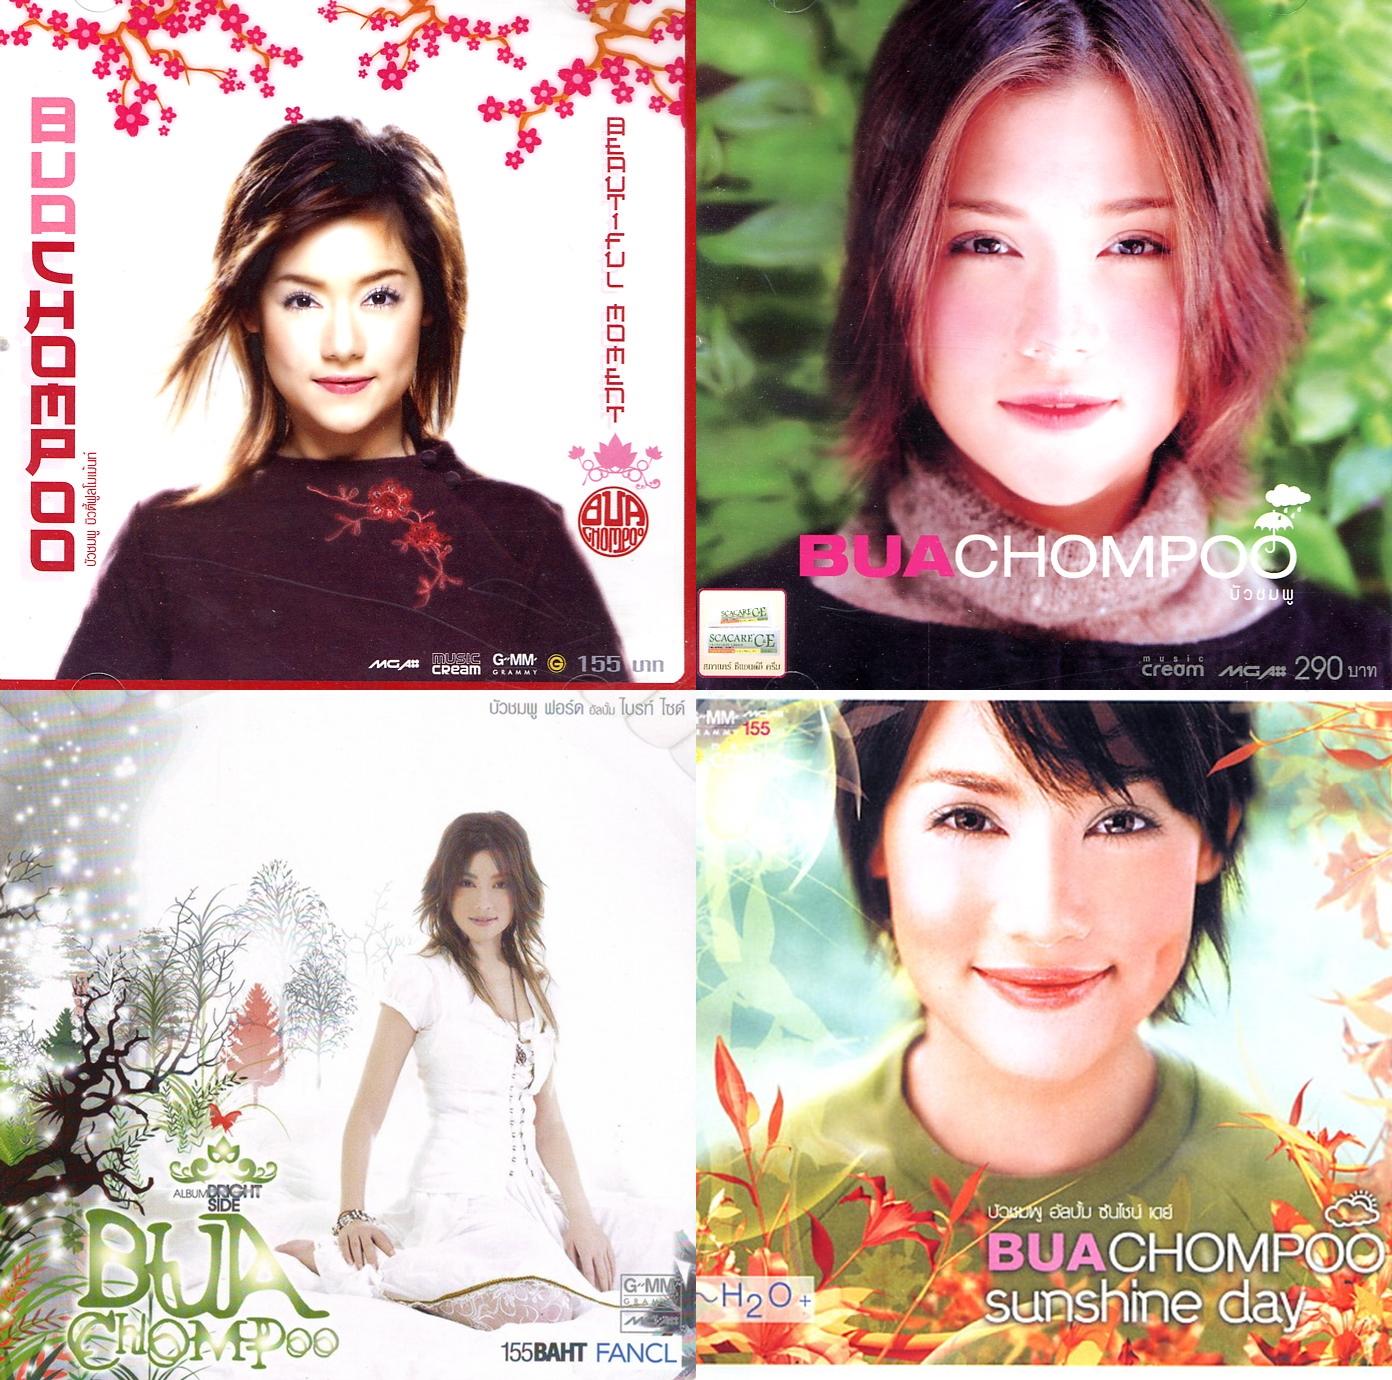 Download [Mp3]-[Album Hit] รวมอัลบั้ม เพราะๆ จากนักร้อง บัวชมพู ฟอร์ด ทั้งหมด 4 Album 4shared By Pleng-mun.com